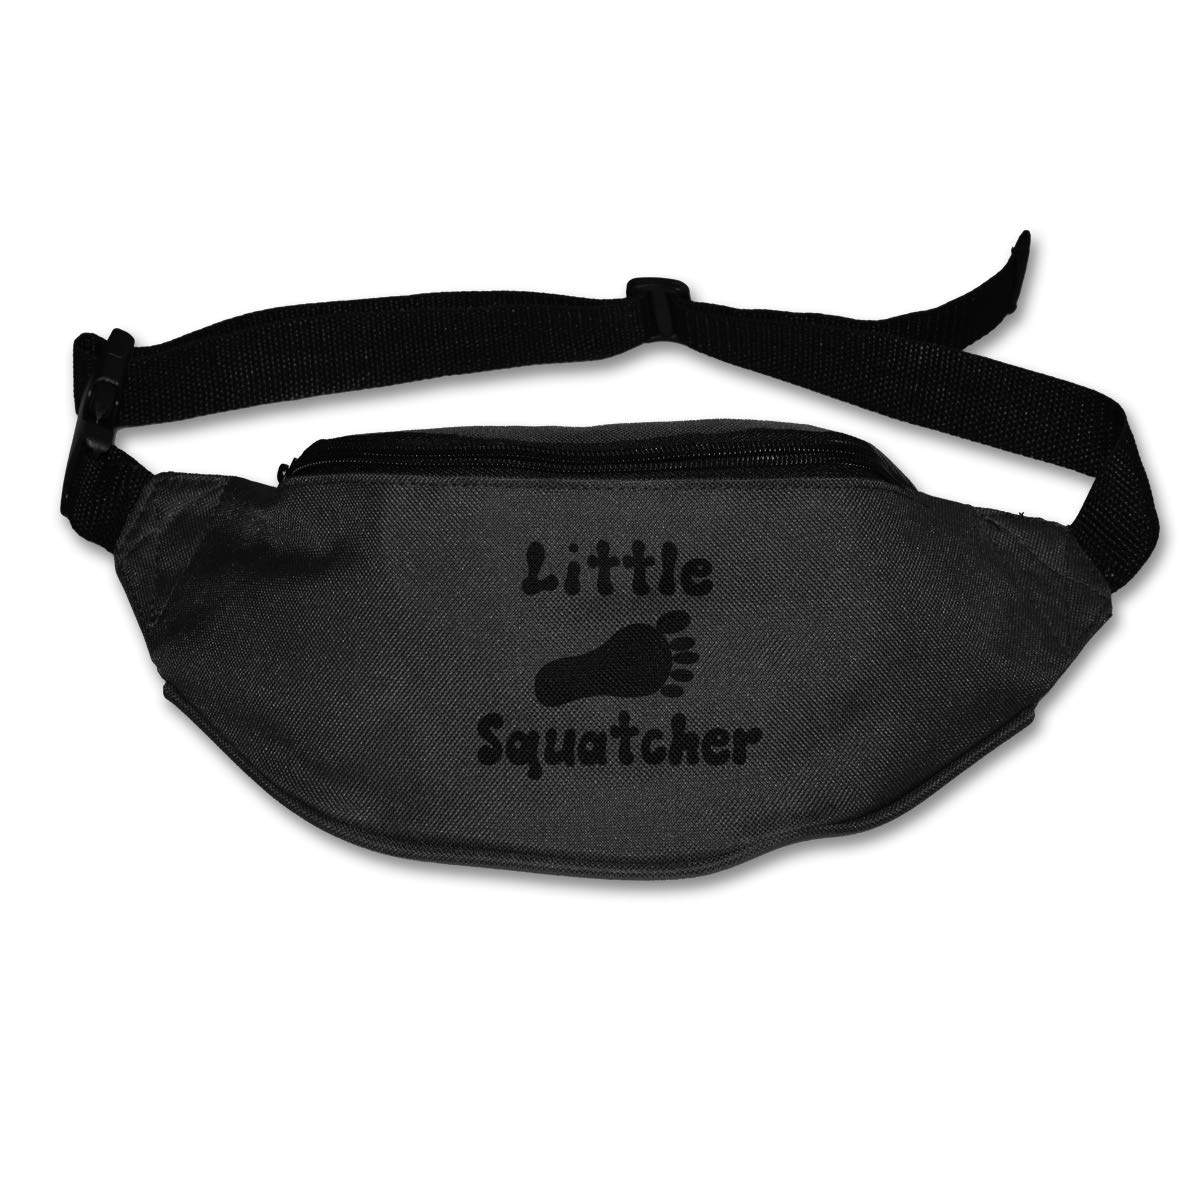 Litter Bigfoot Sasquatch Sport Waist Pack Fanny Pack Adjustable For Hike